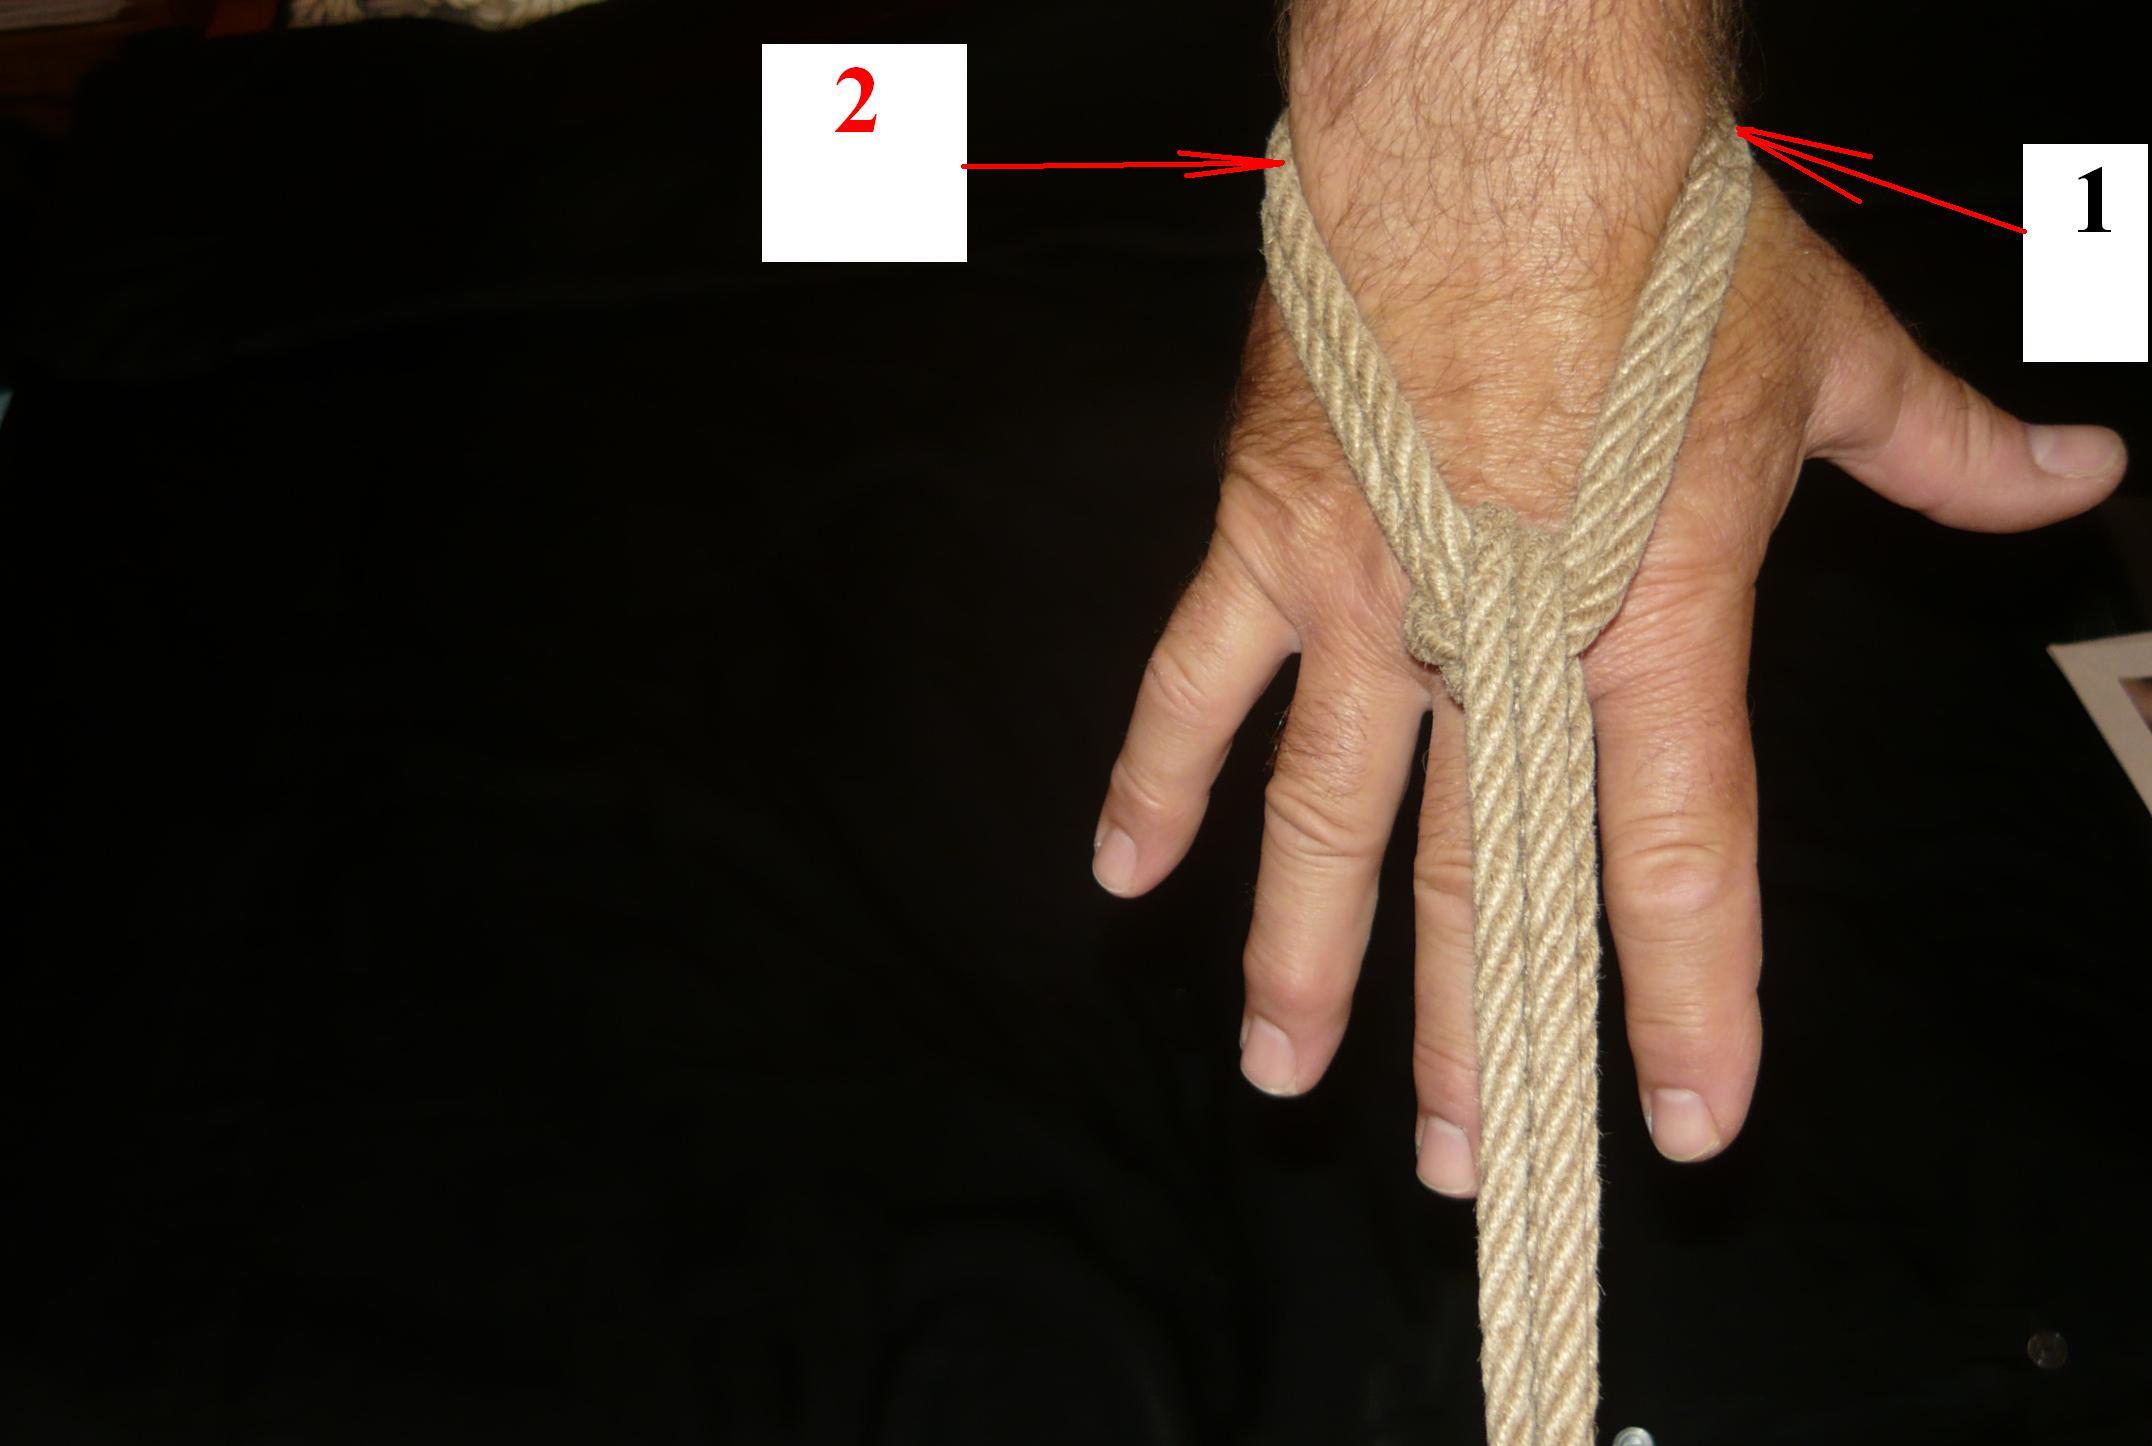 6.3 lina na dłoni z góry